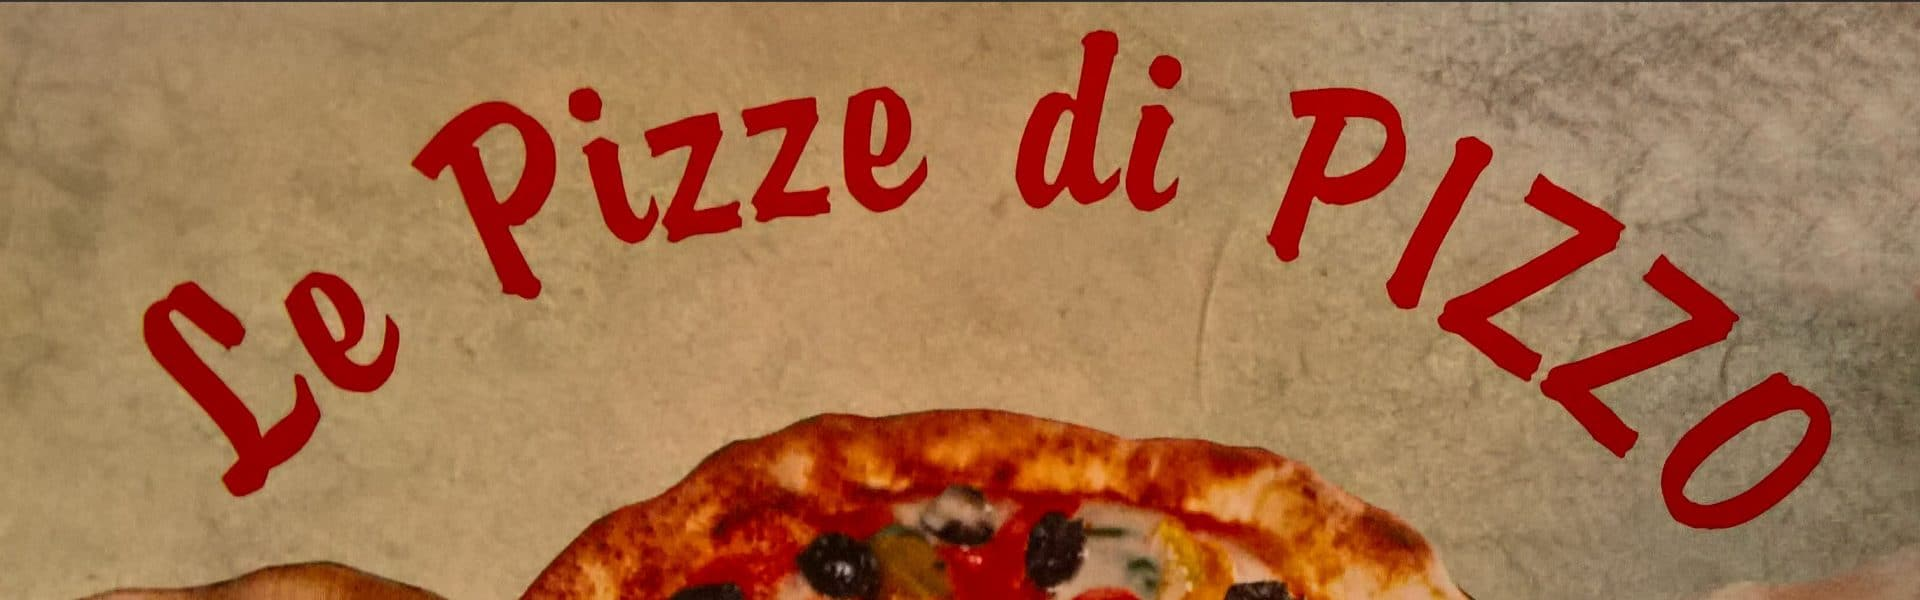 Le Pizze di Pizzo